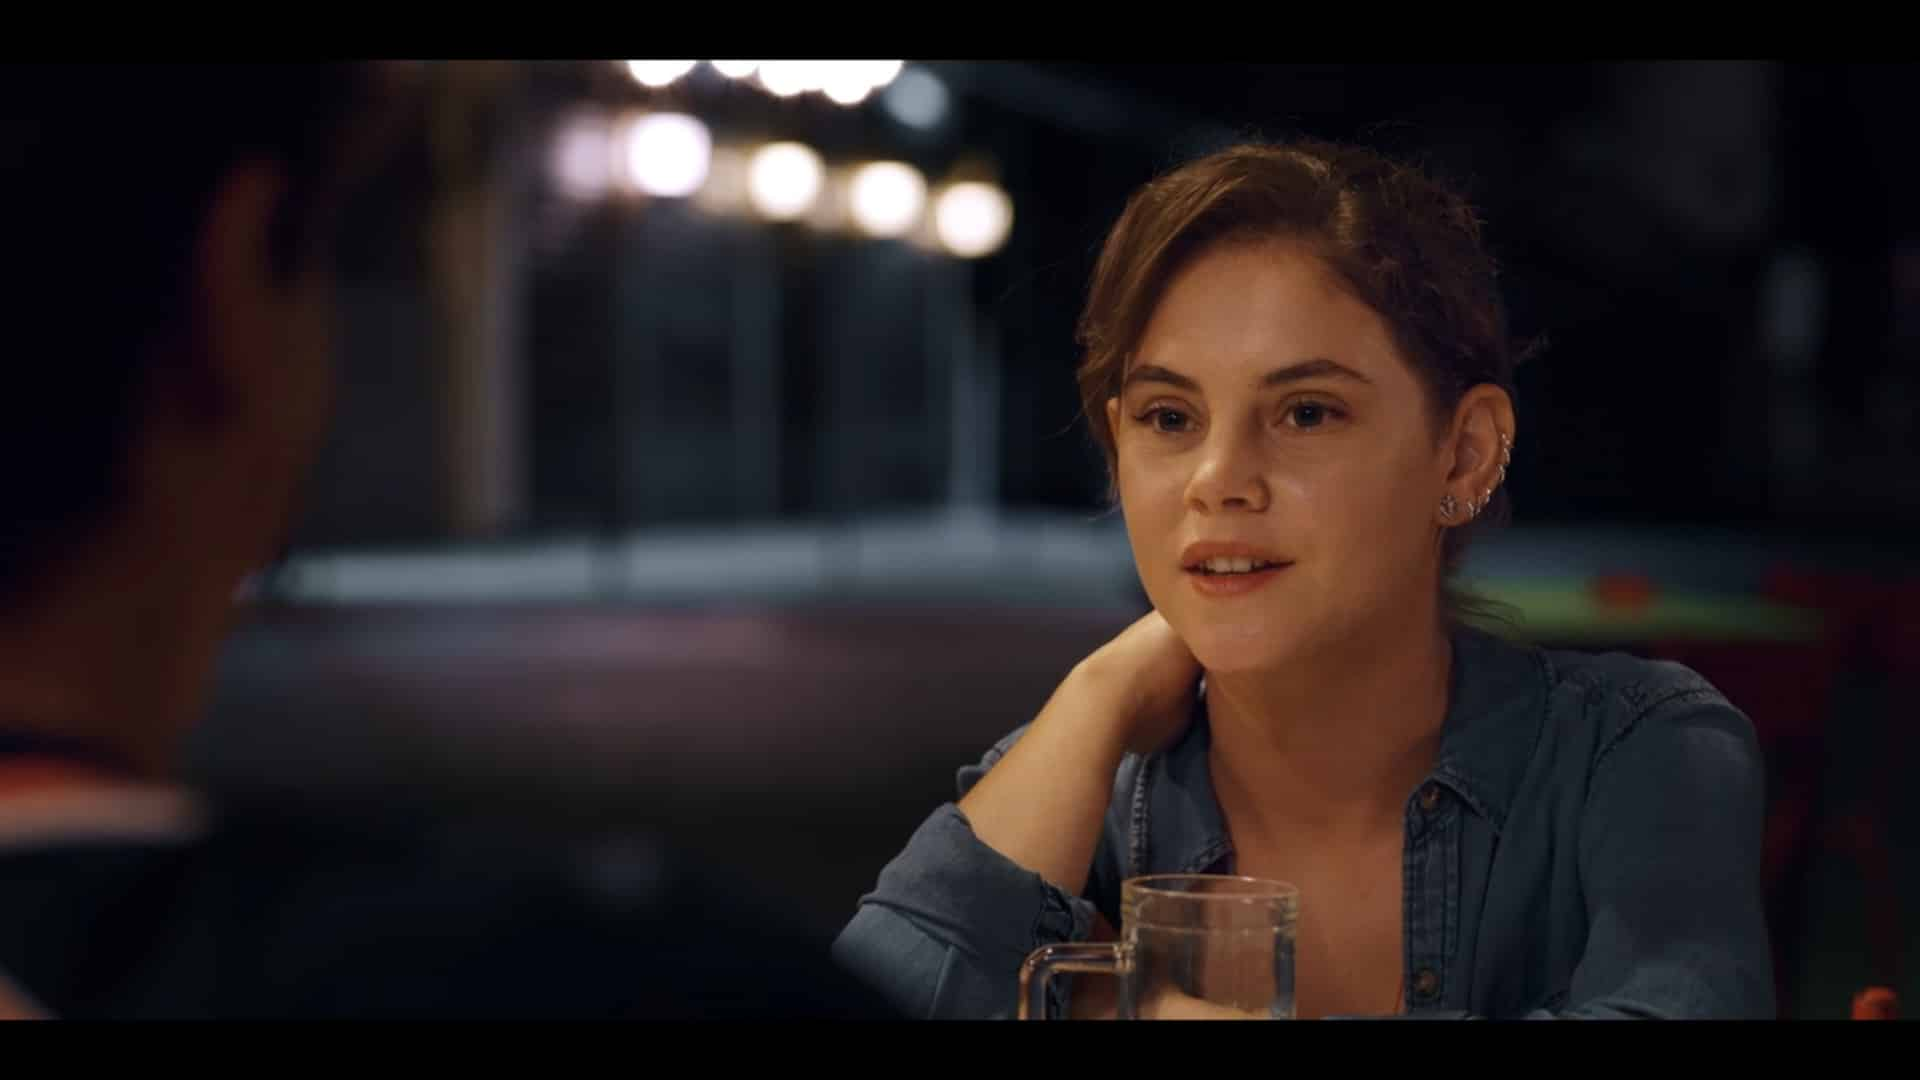 Sara (Elvira Camarrone) on a date with Lorenzo